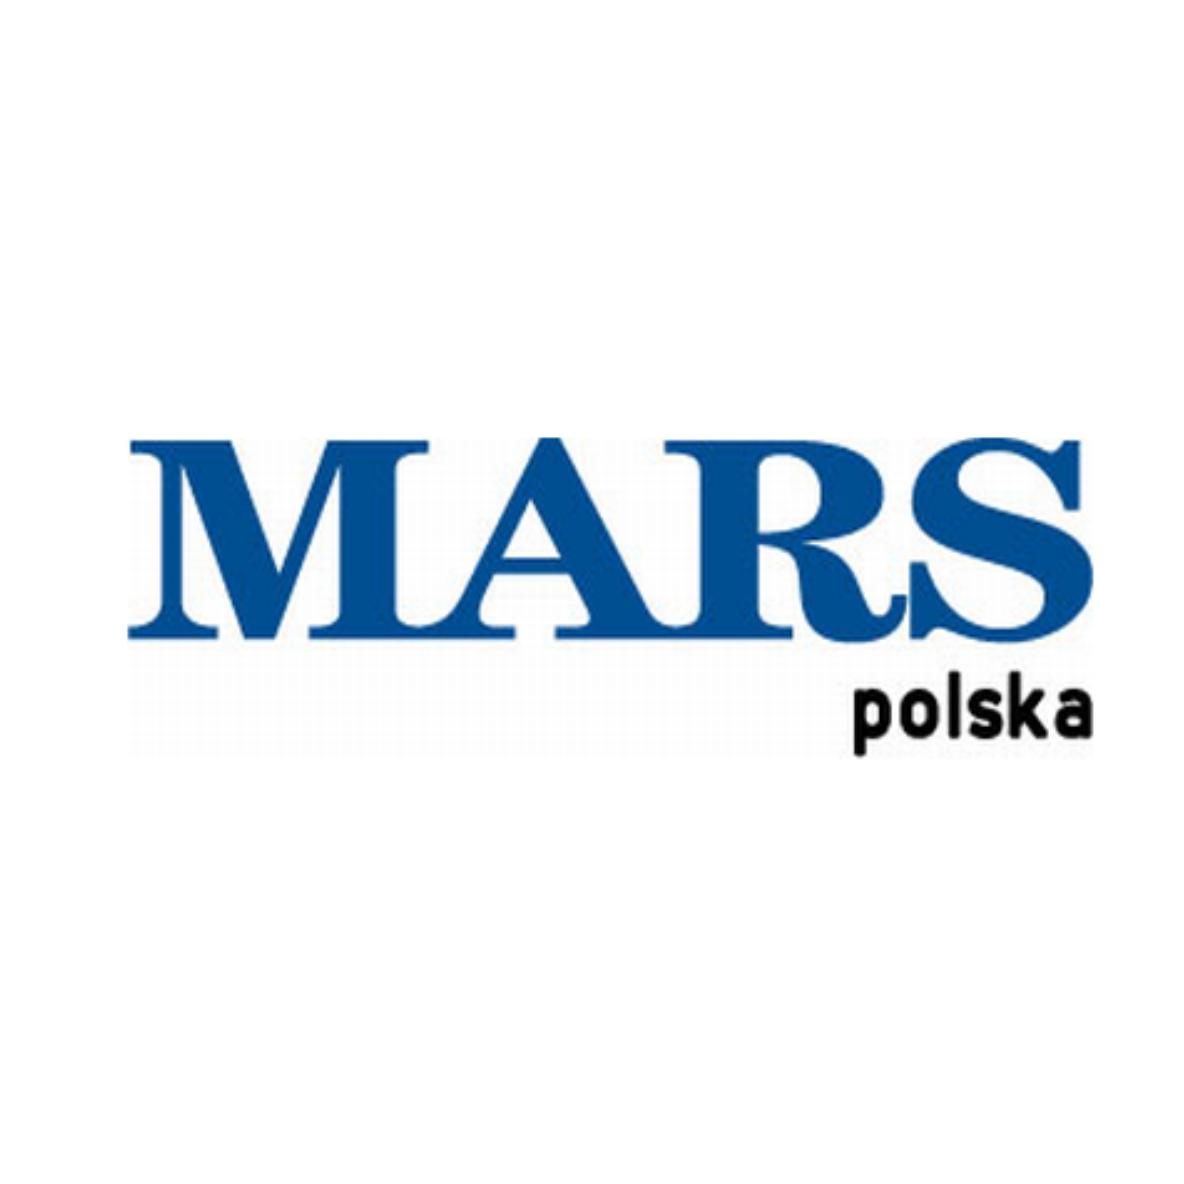 mars polska